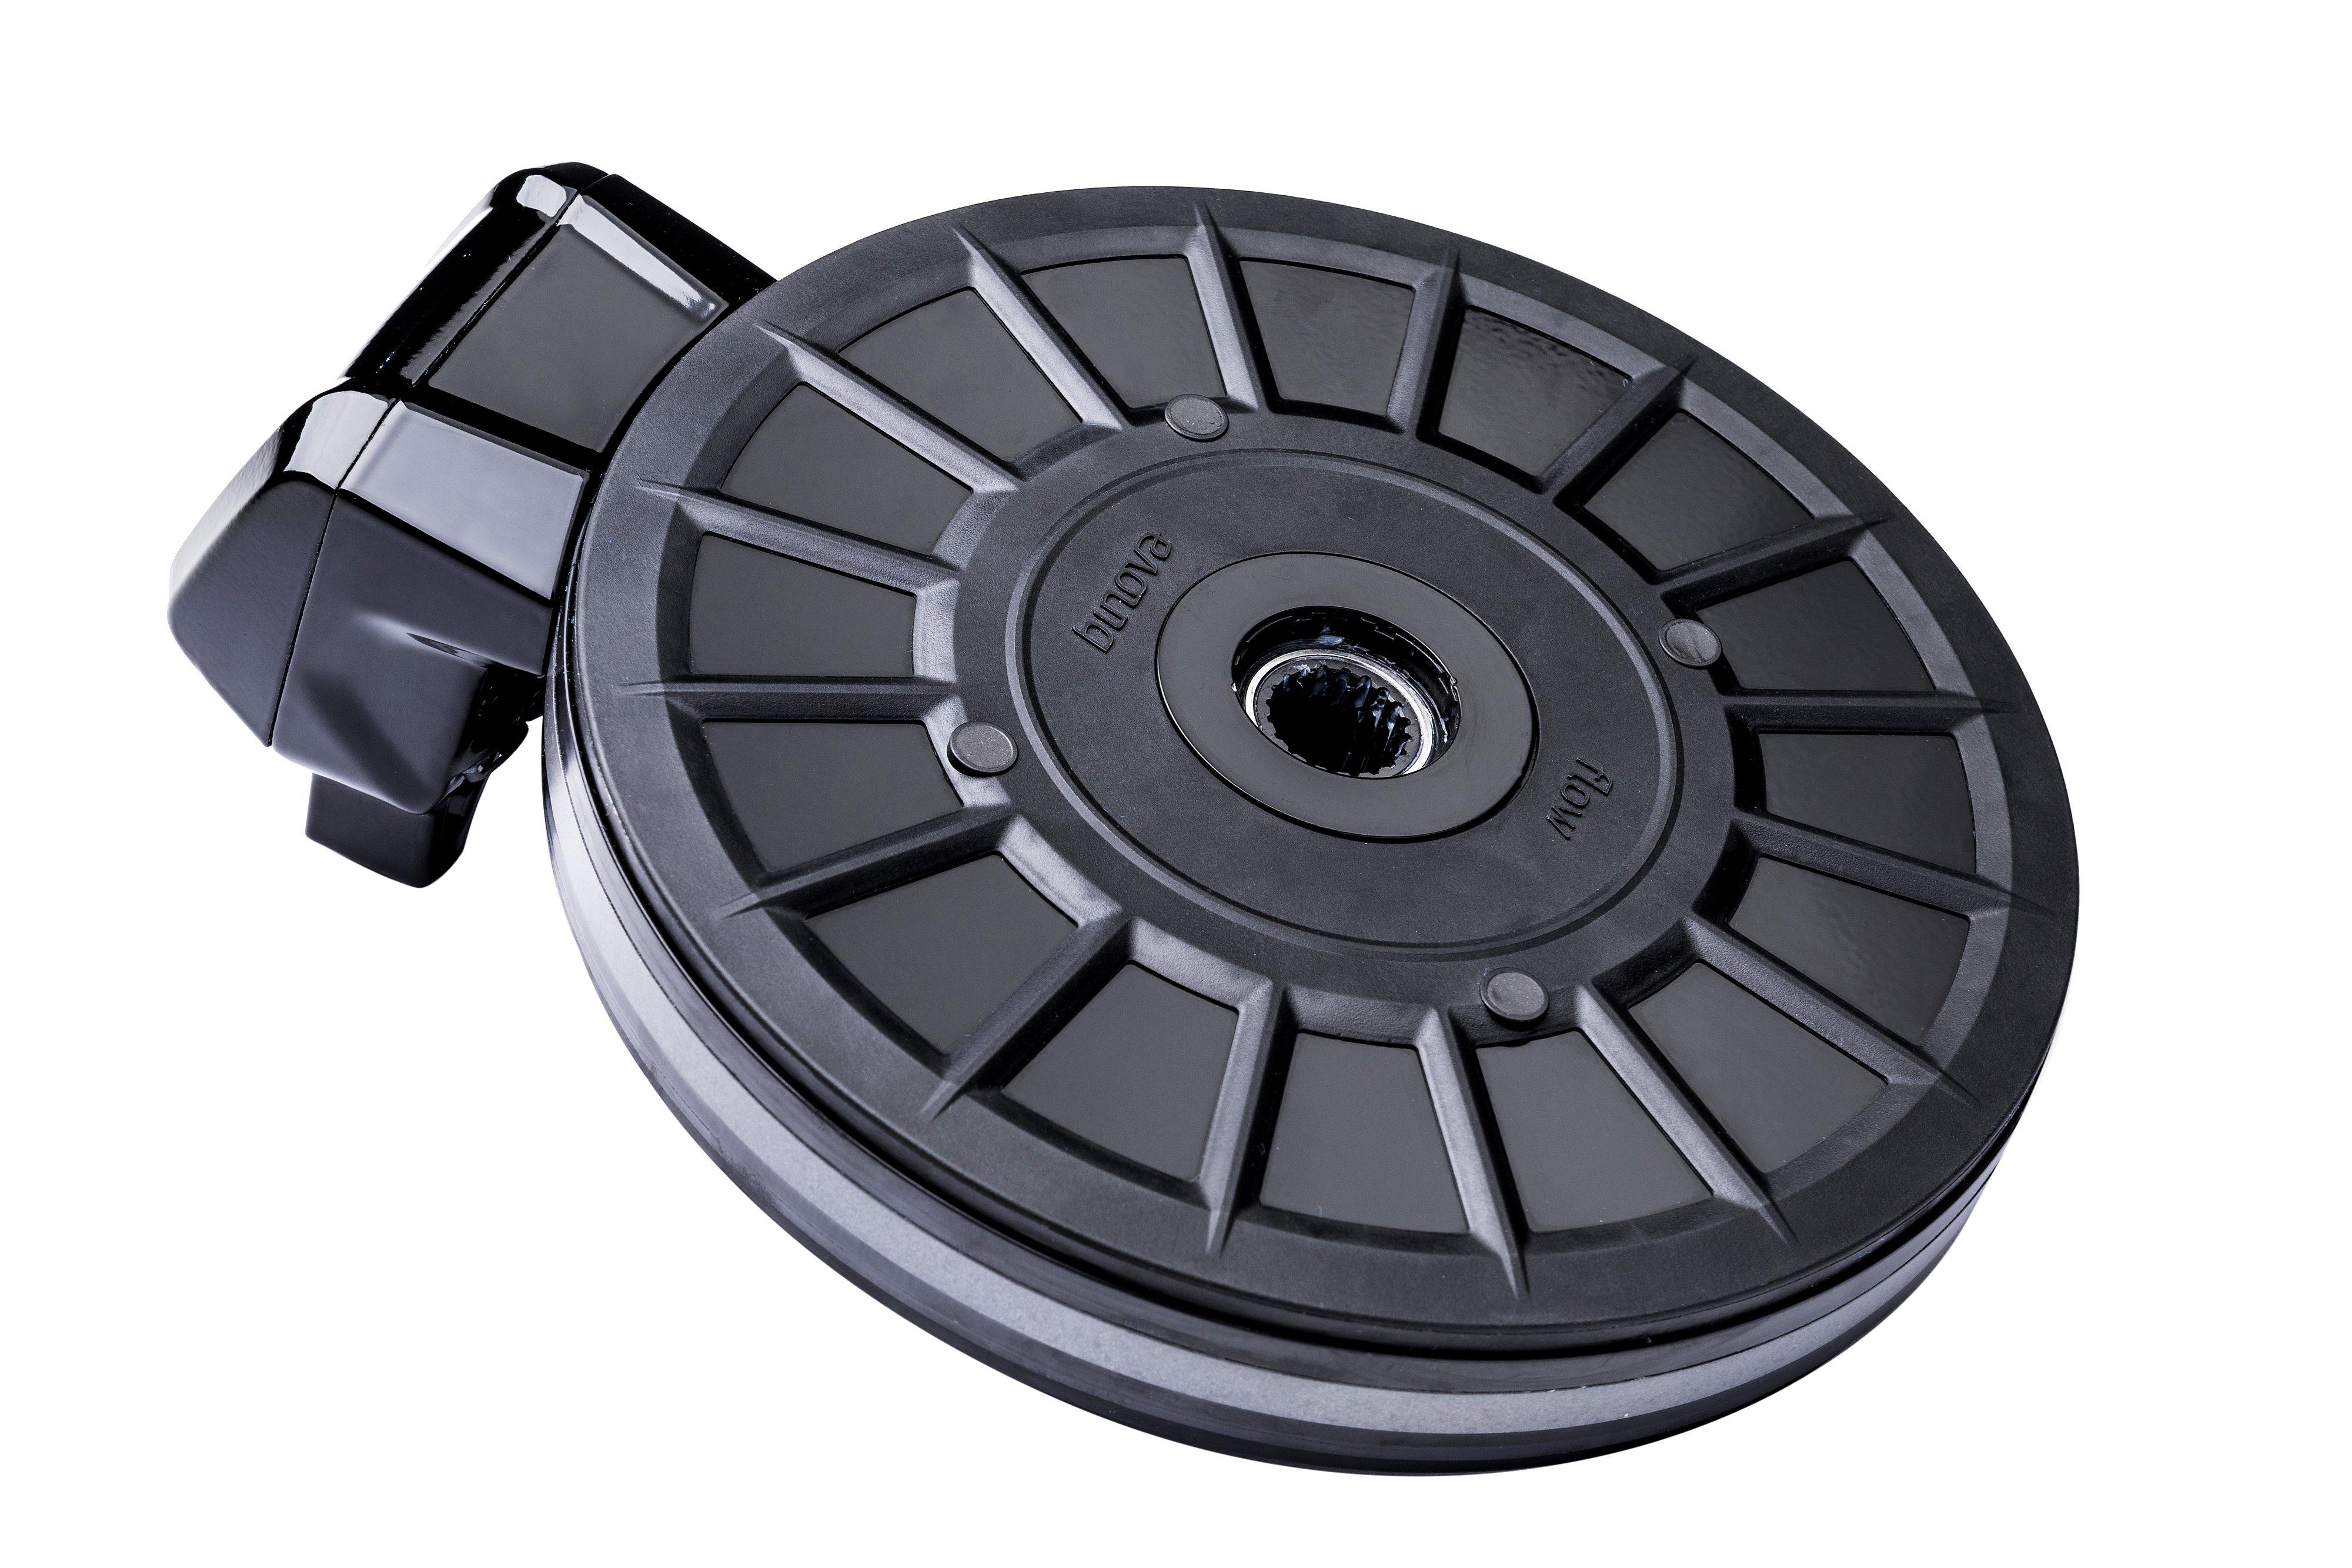 Binova Motor Vorderseite